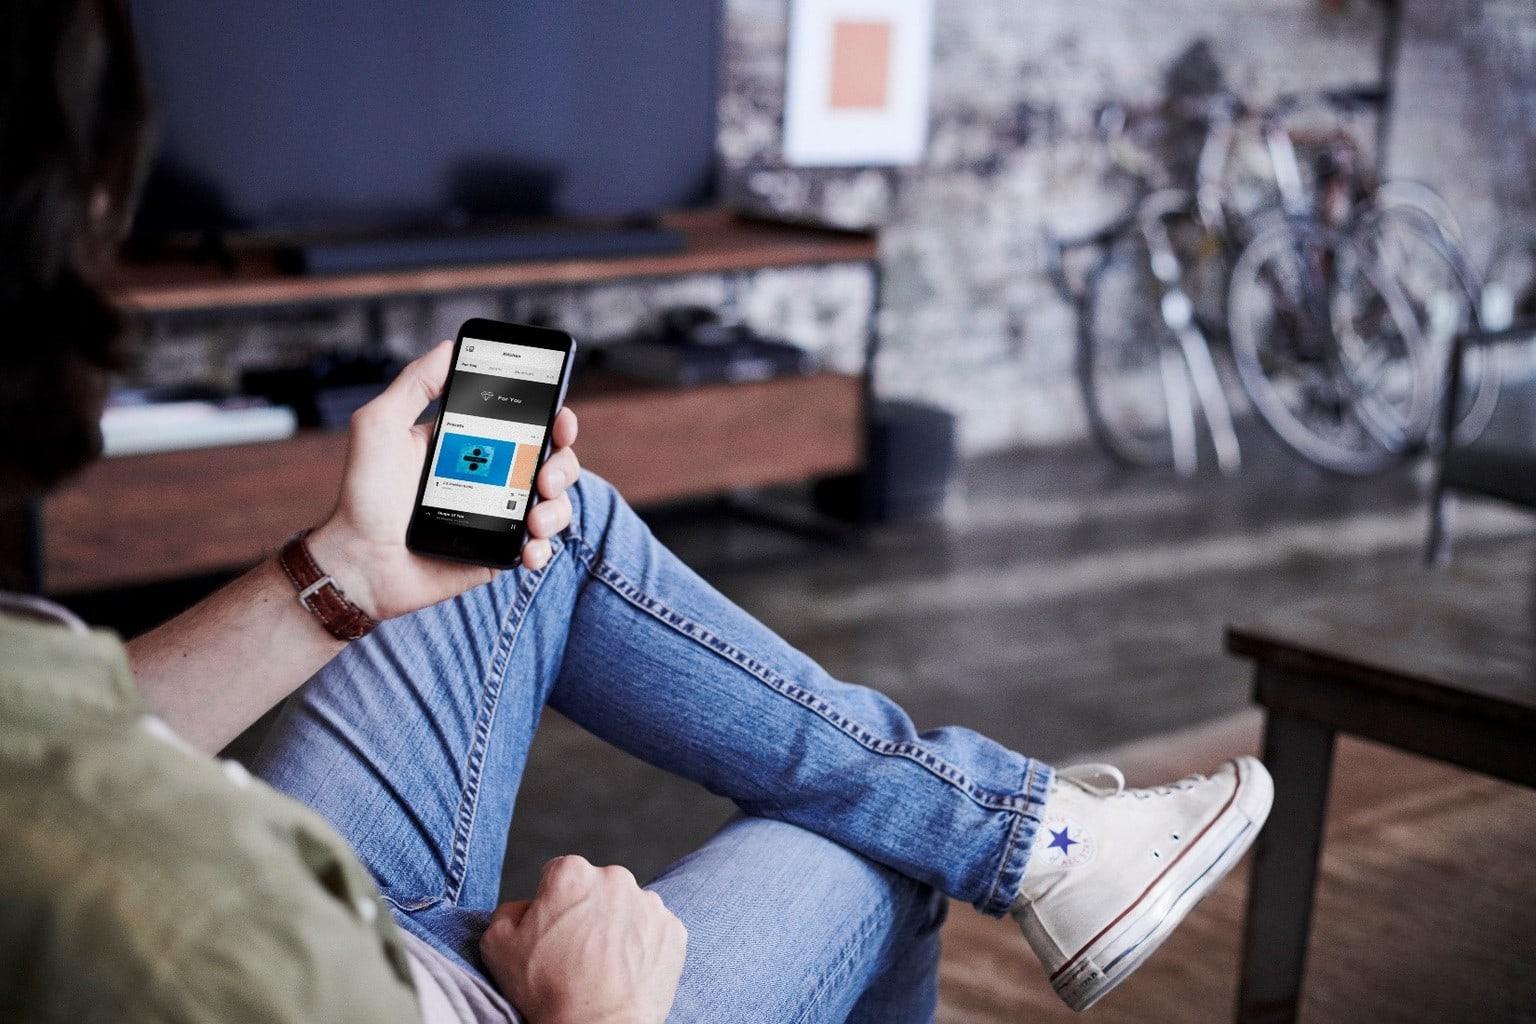 Bose app on smartphone